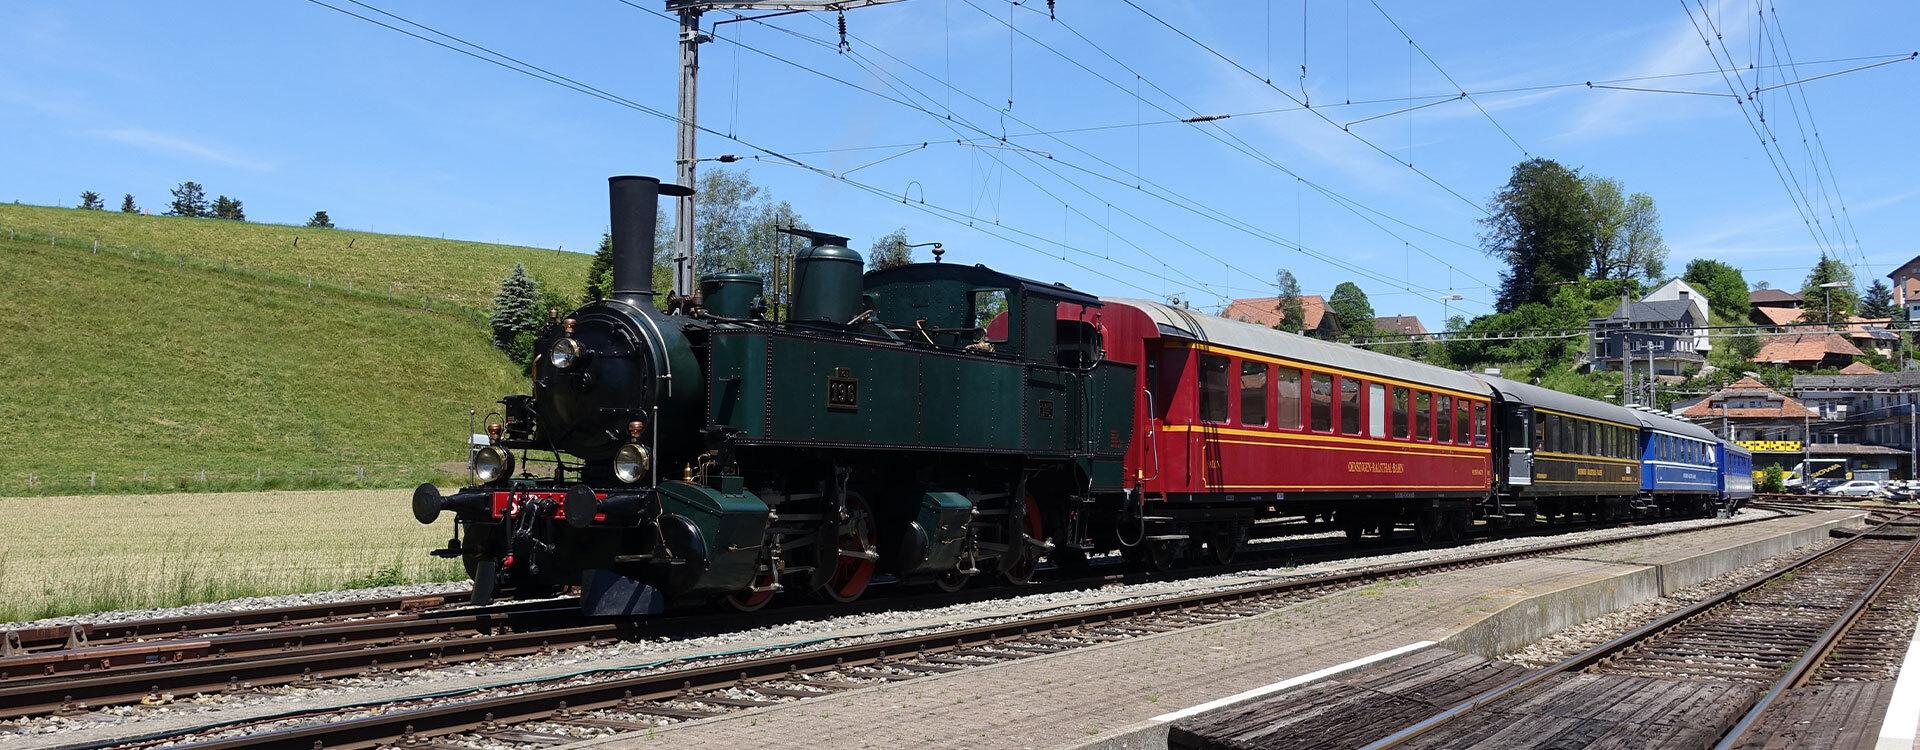 Anlässe & Extrafahrten - Oensingen-Balsthal-Bahn AG